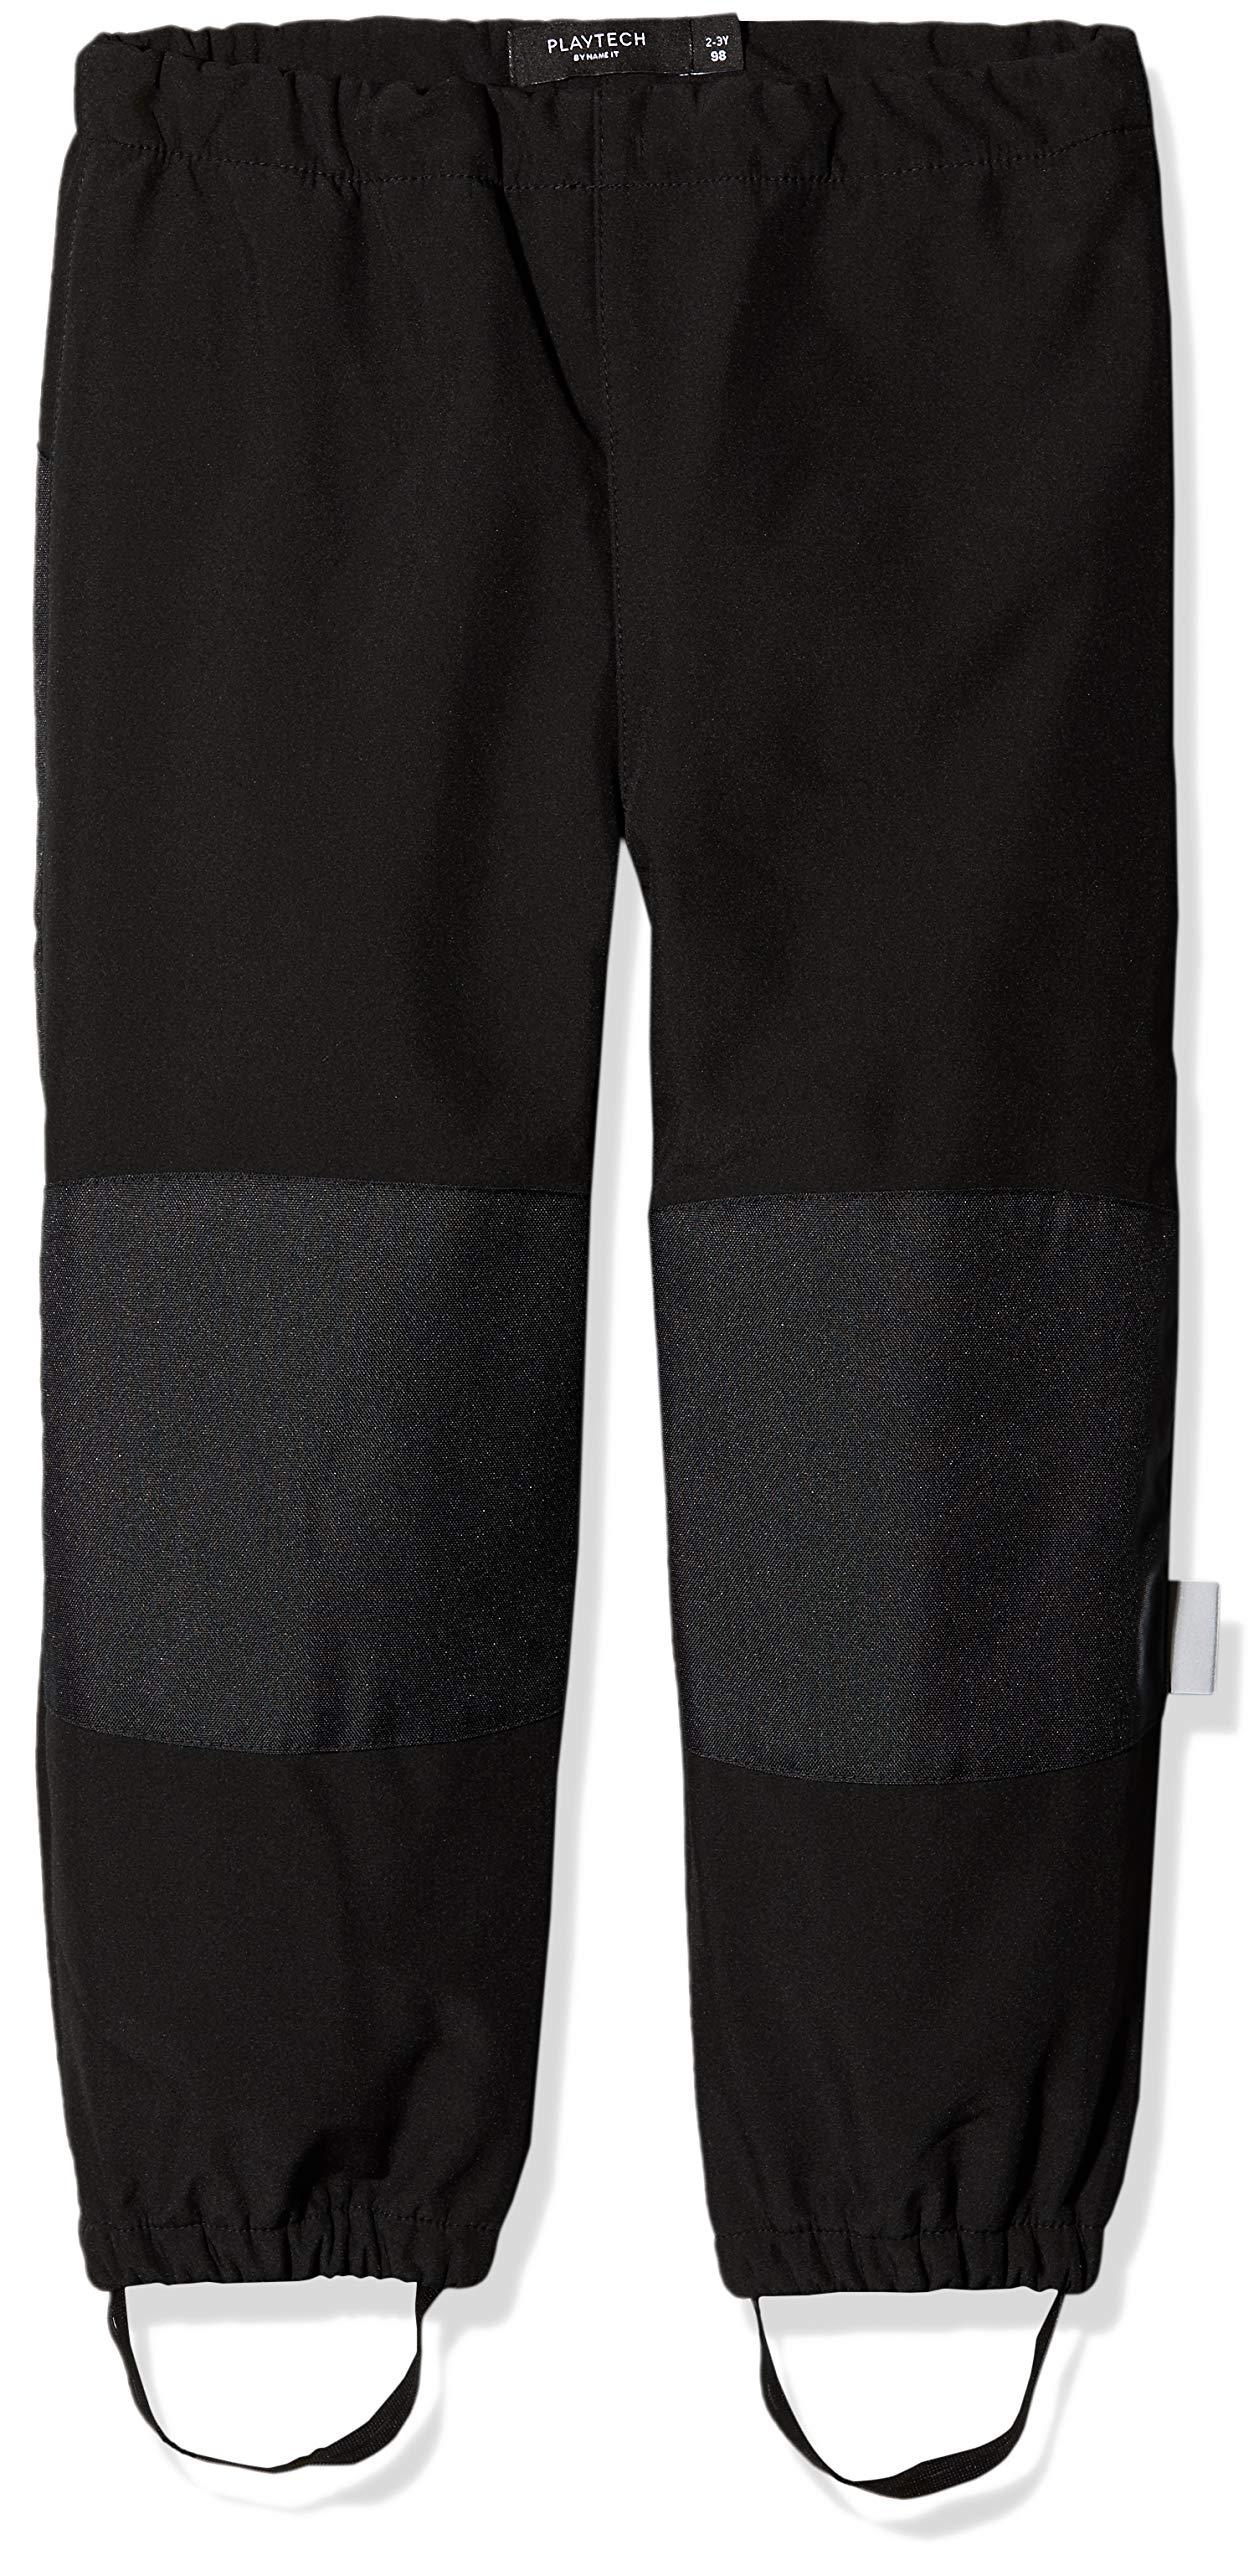 NAME IT Nitalfa Softshell Pant MZ Fo Noos Pantalones Impermeable para Bebés 1